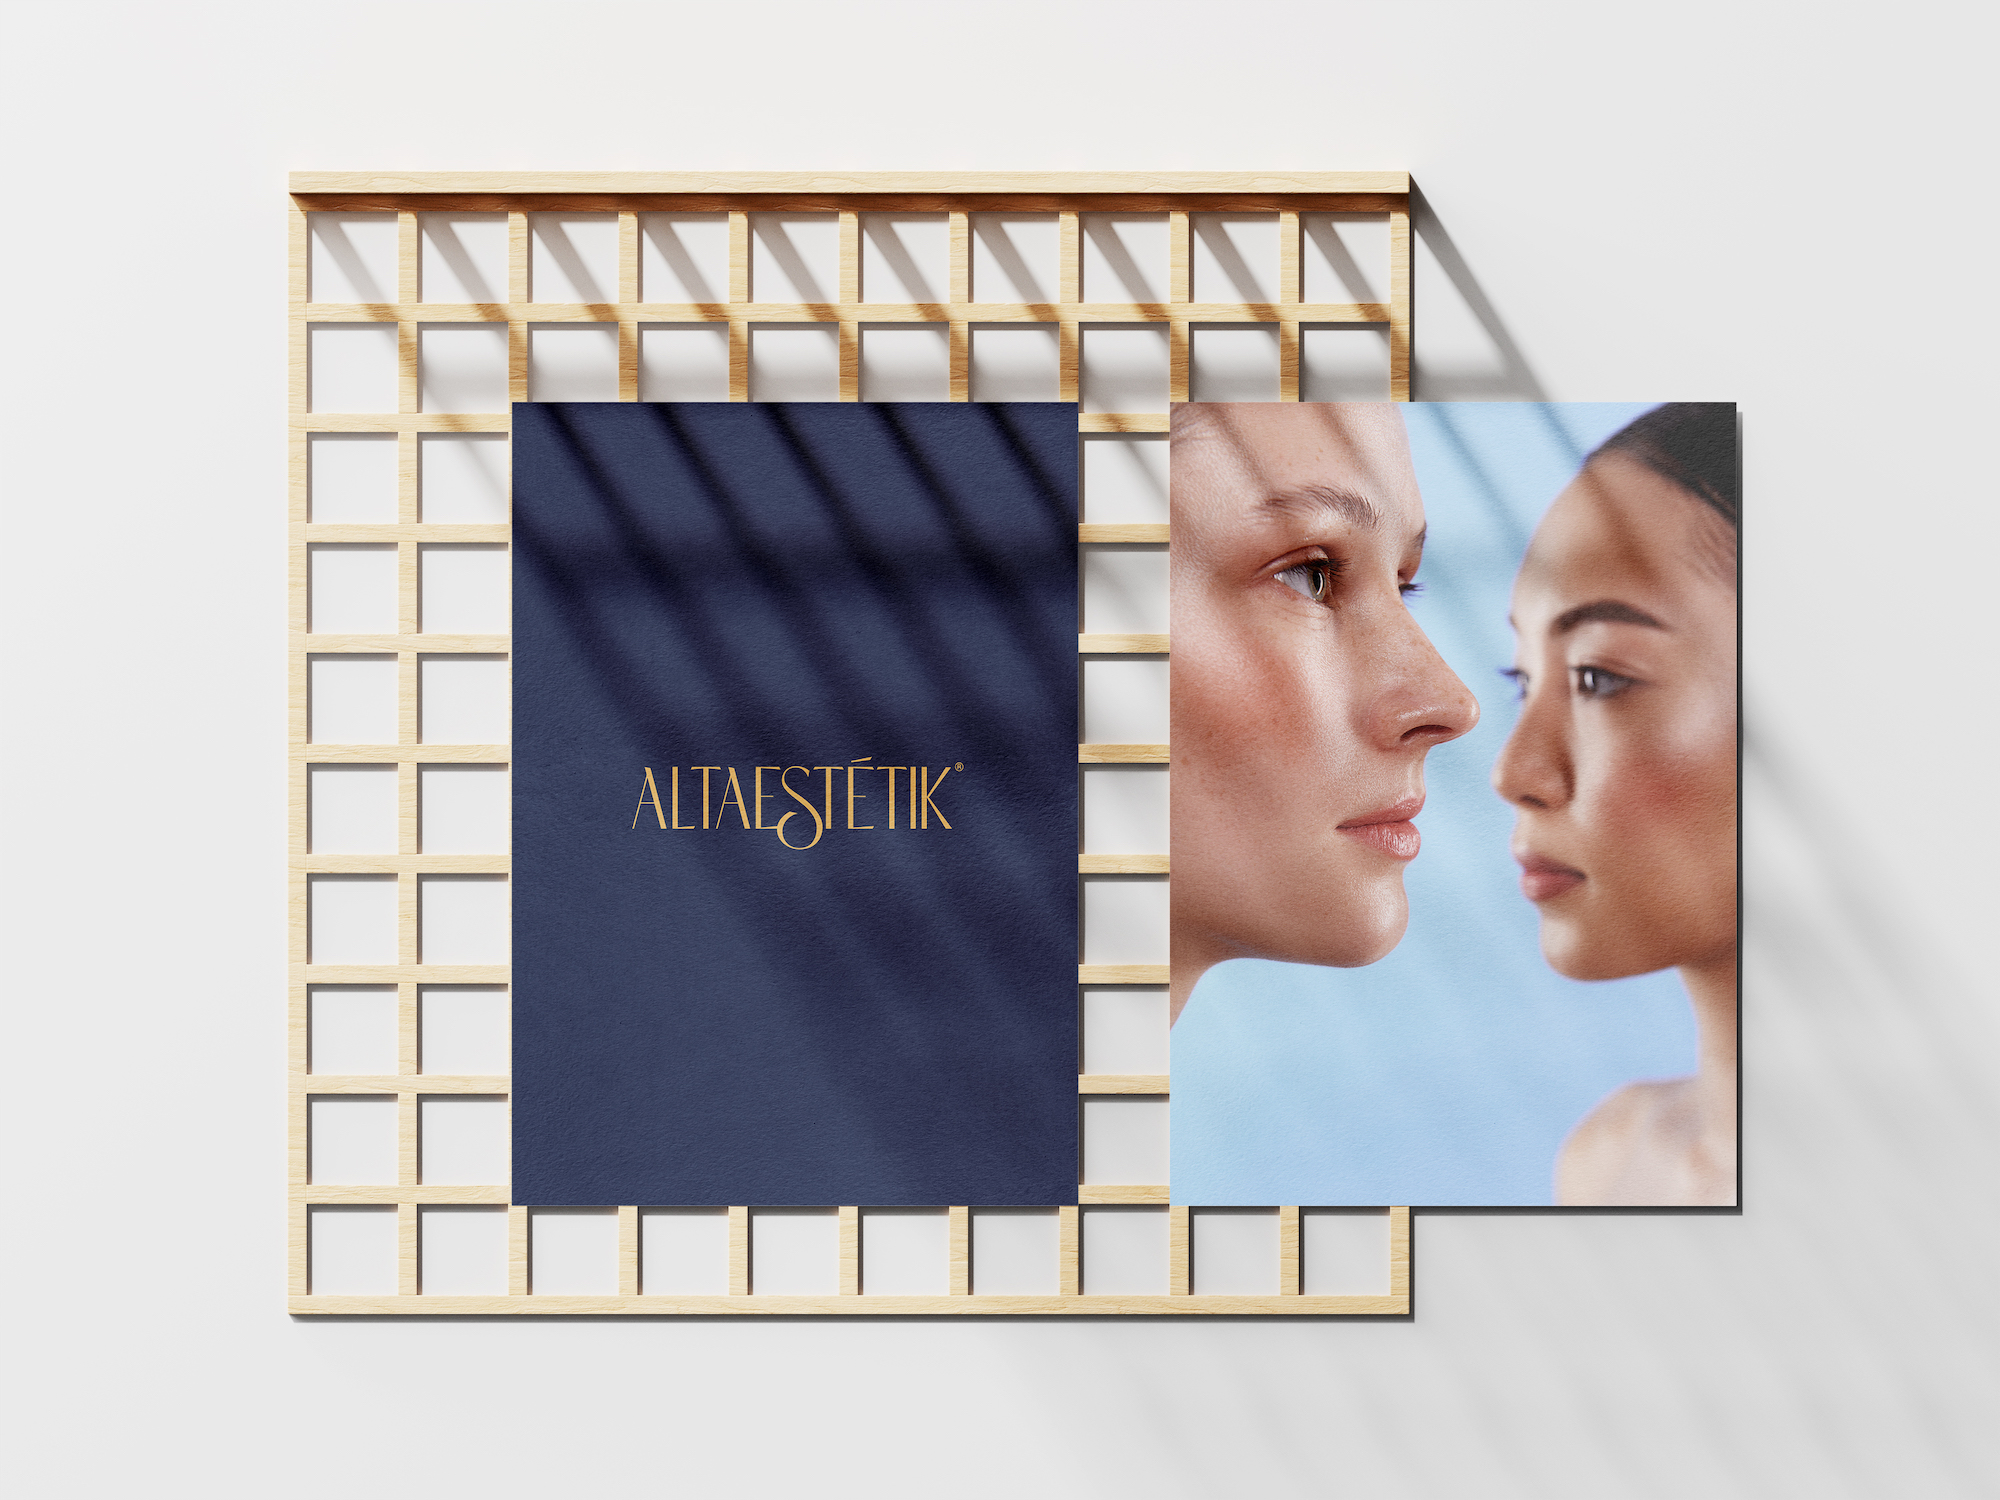 Altaestétik New Brand Identity By Brandtown Studio